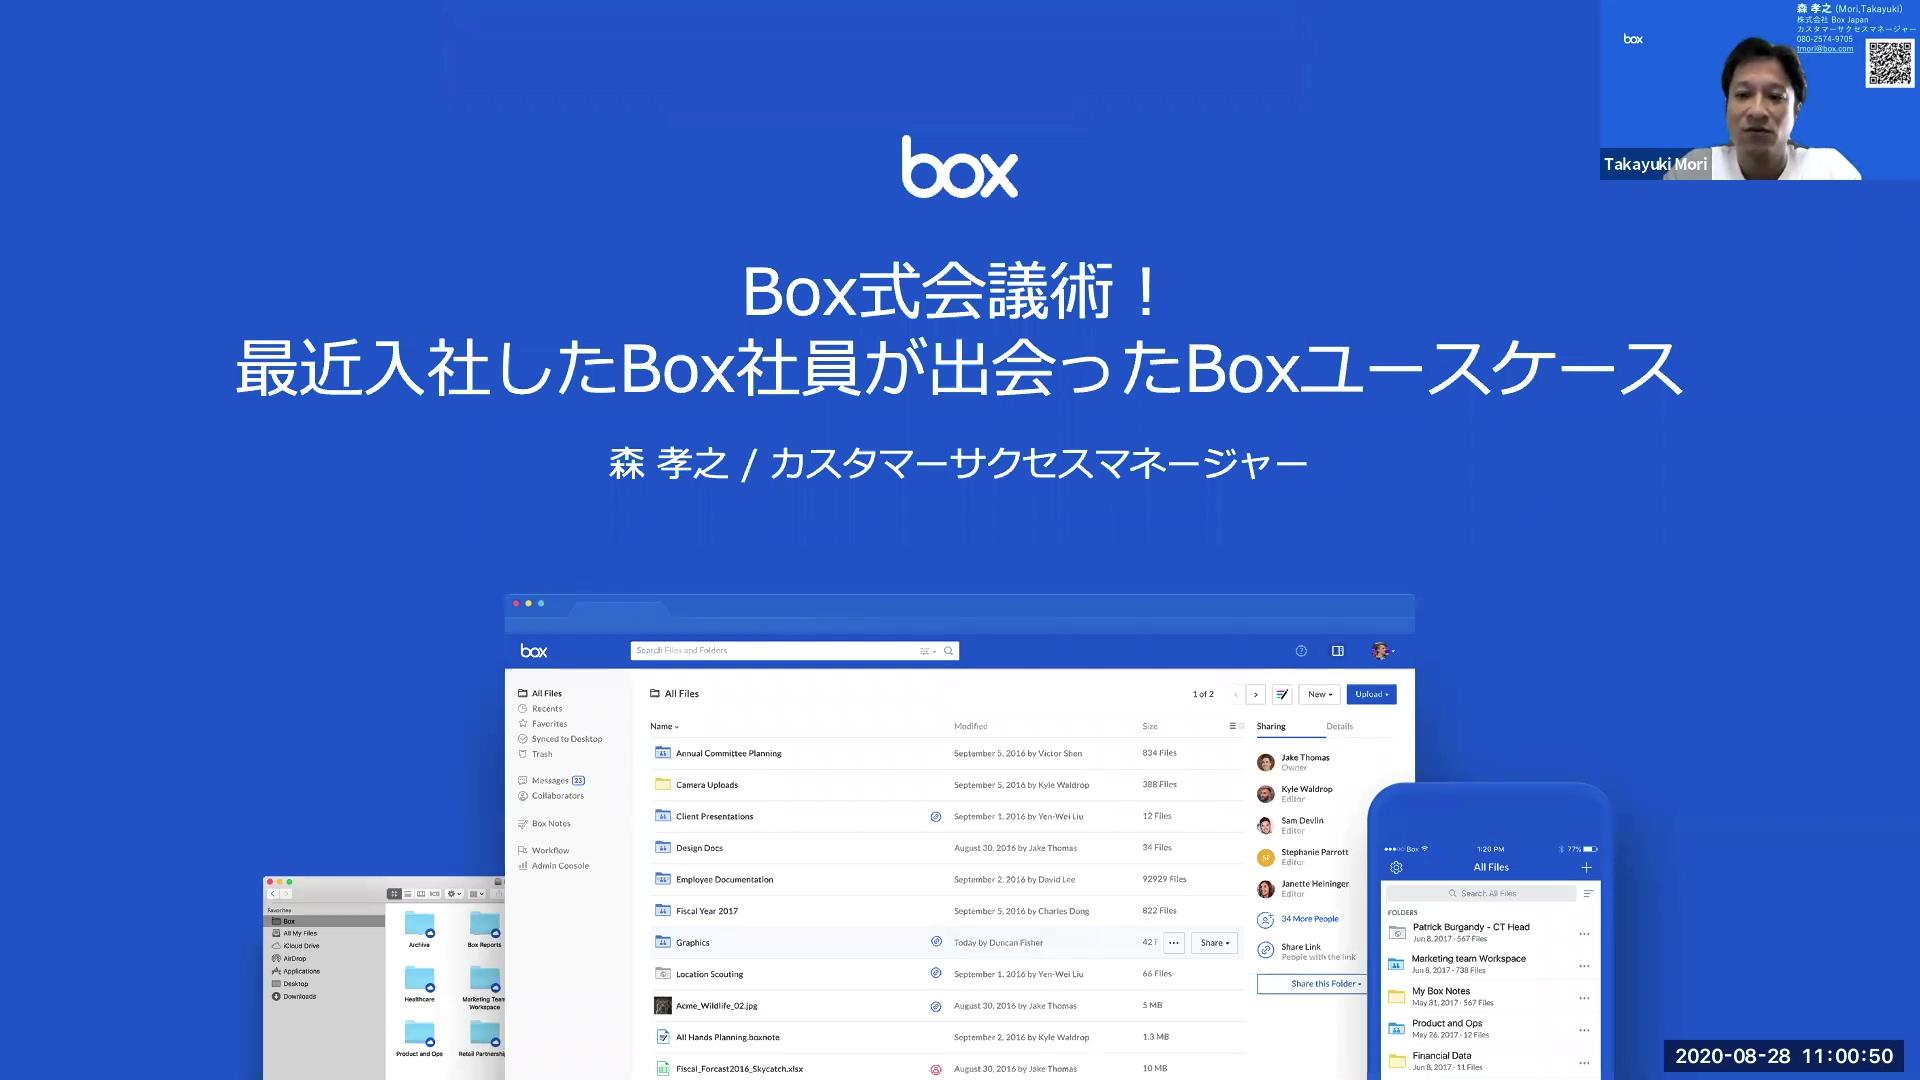 Box Japanユースケース ーBox式会議術ー(2020.8.28)